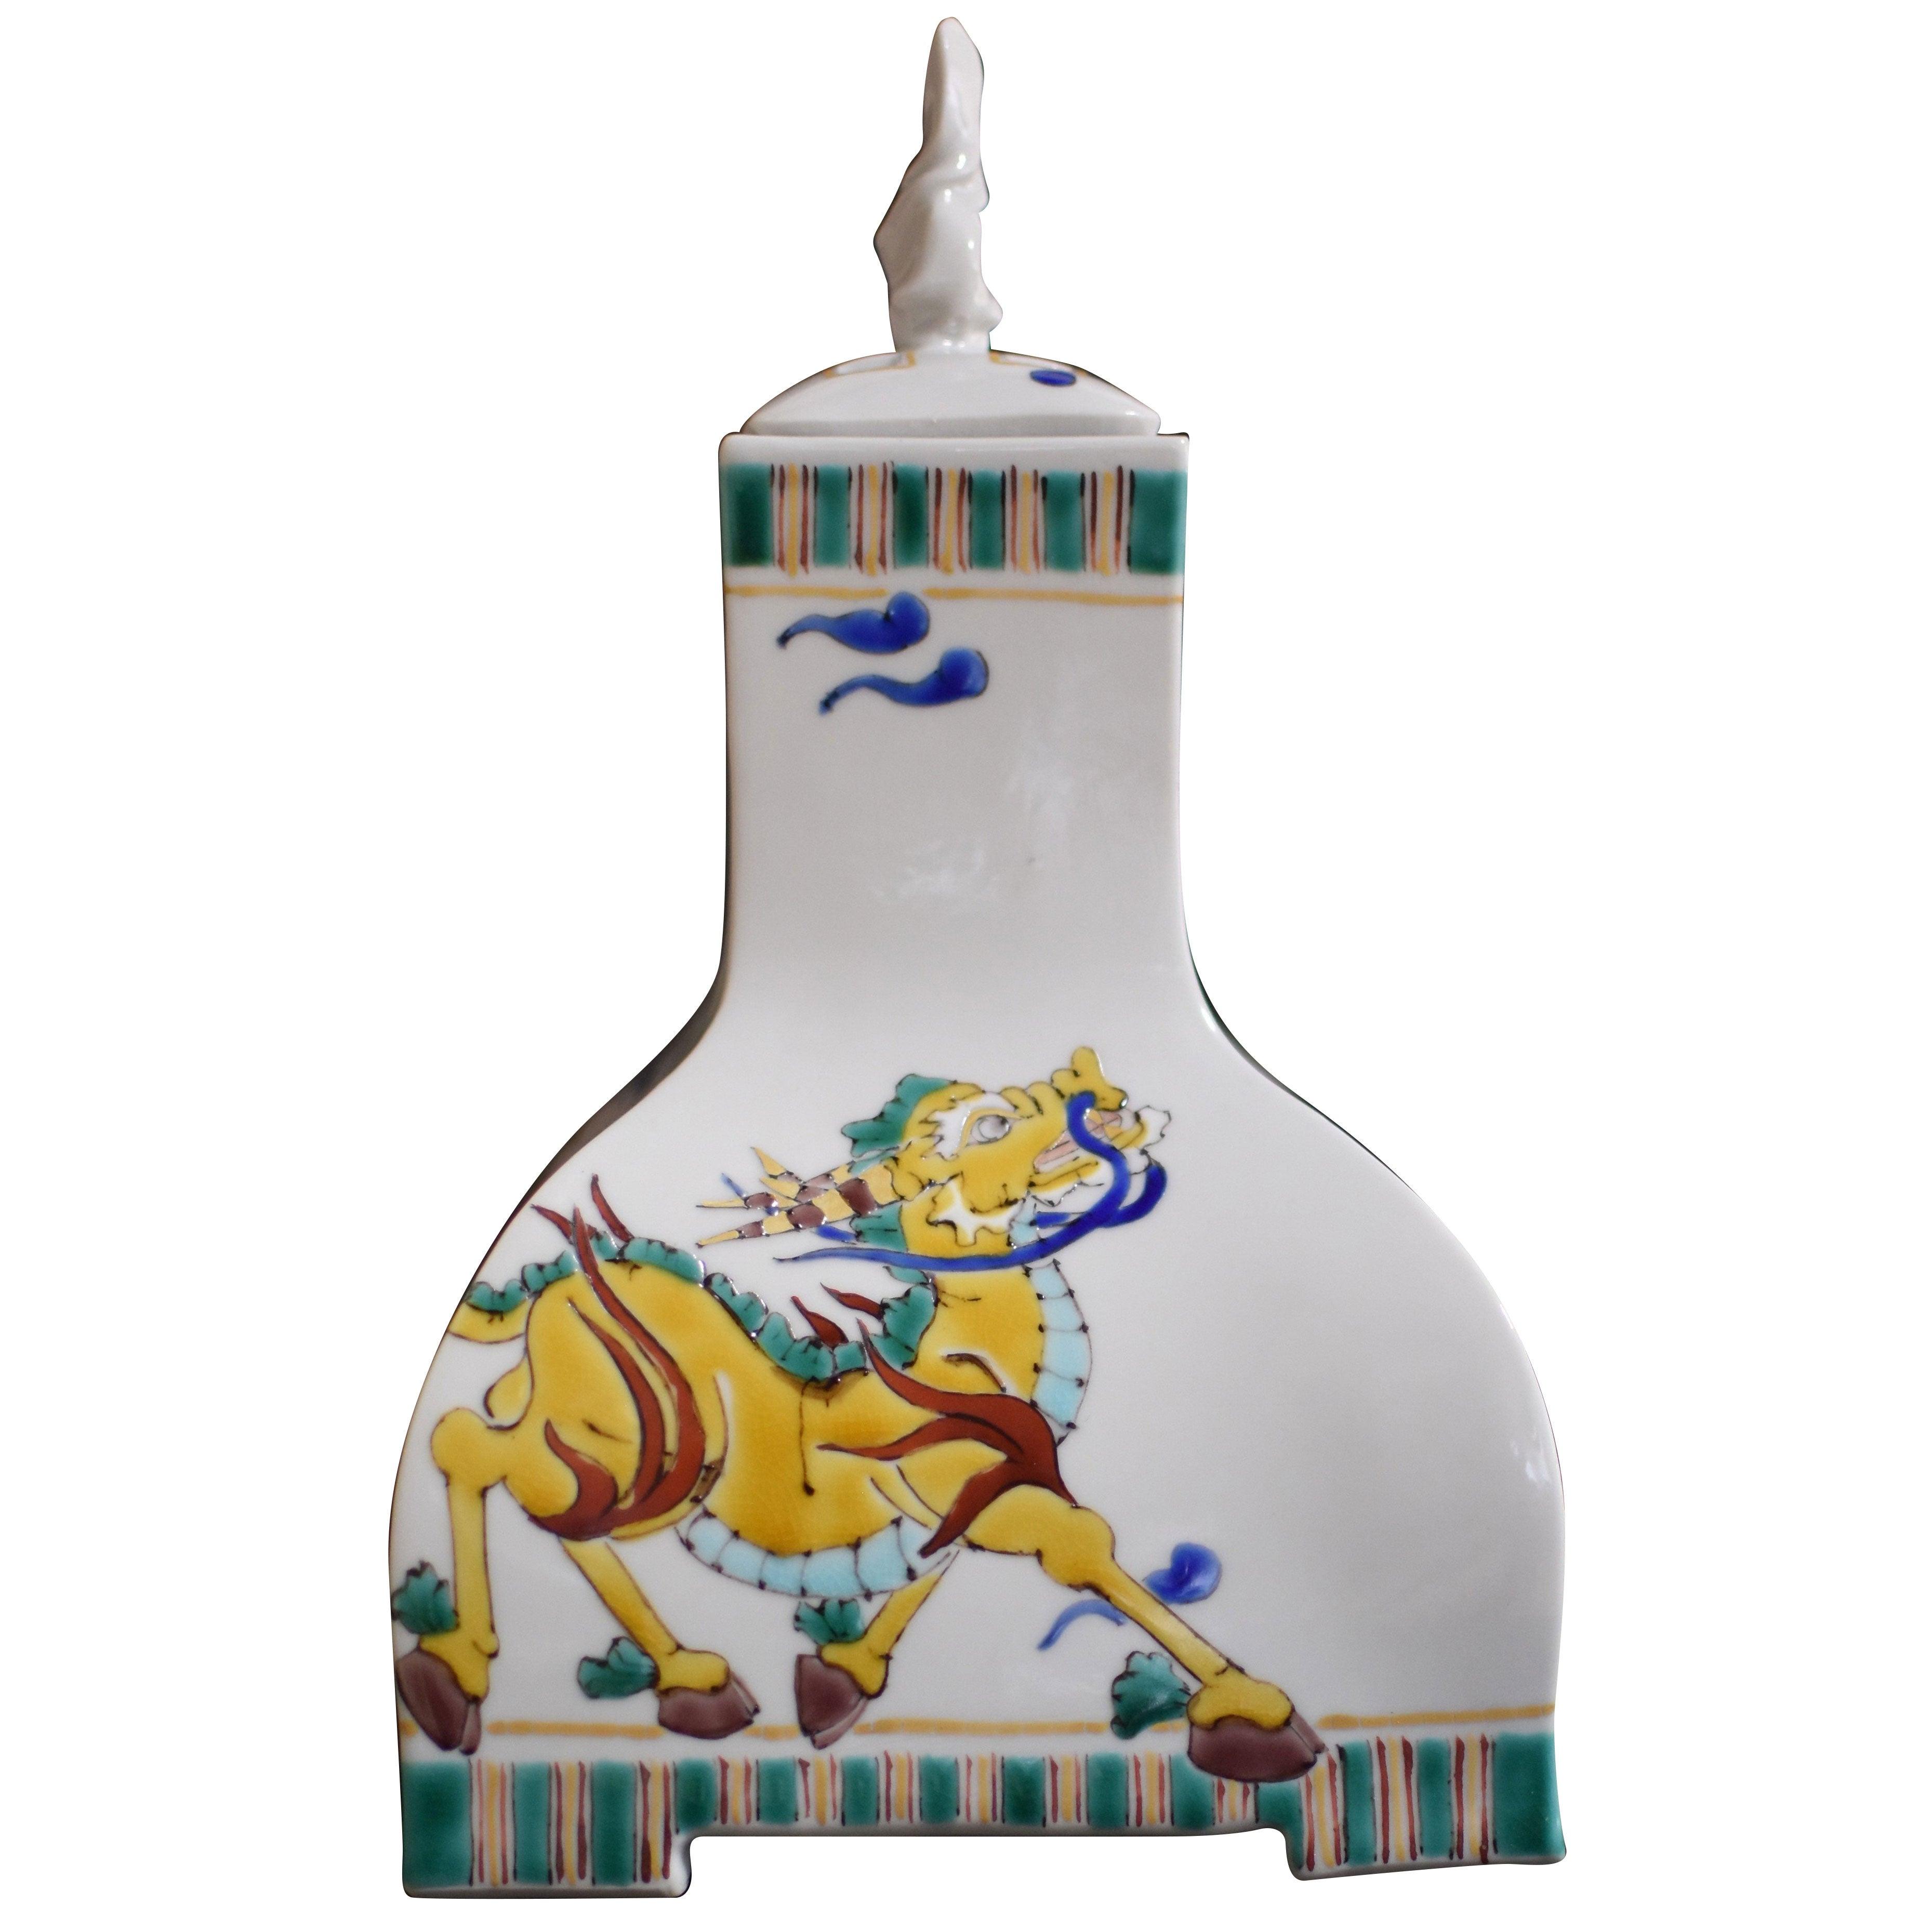 Japanese Kutani Yellow Decorative Porcelain Vessel by Contemporary Master Artist